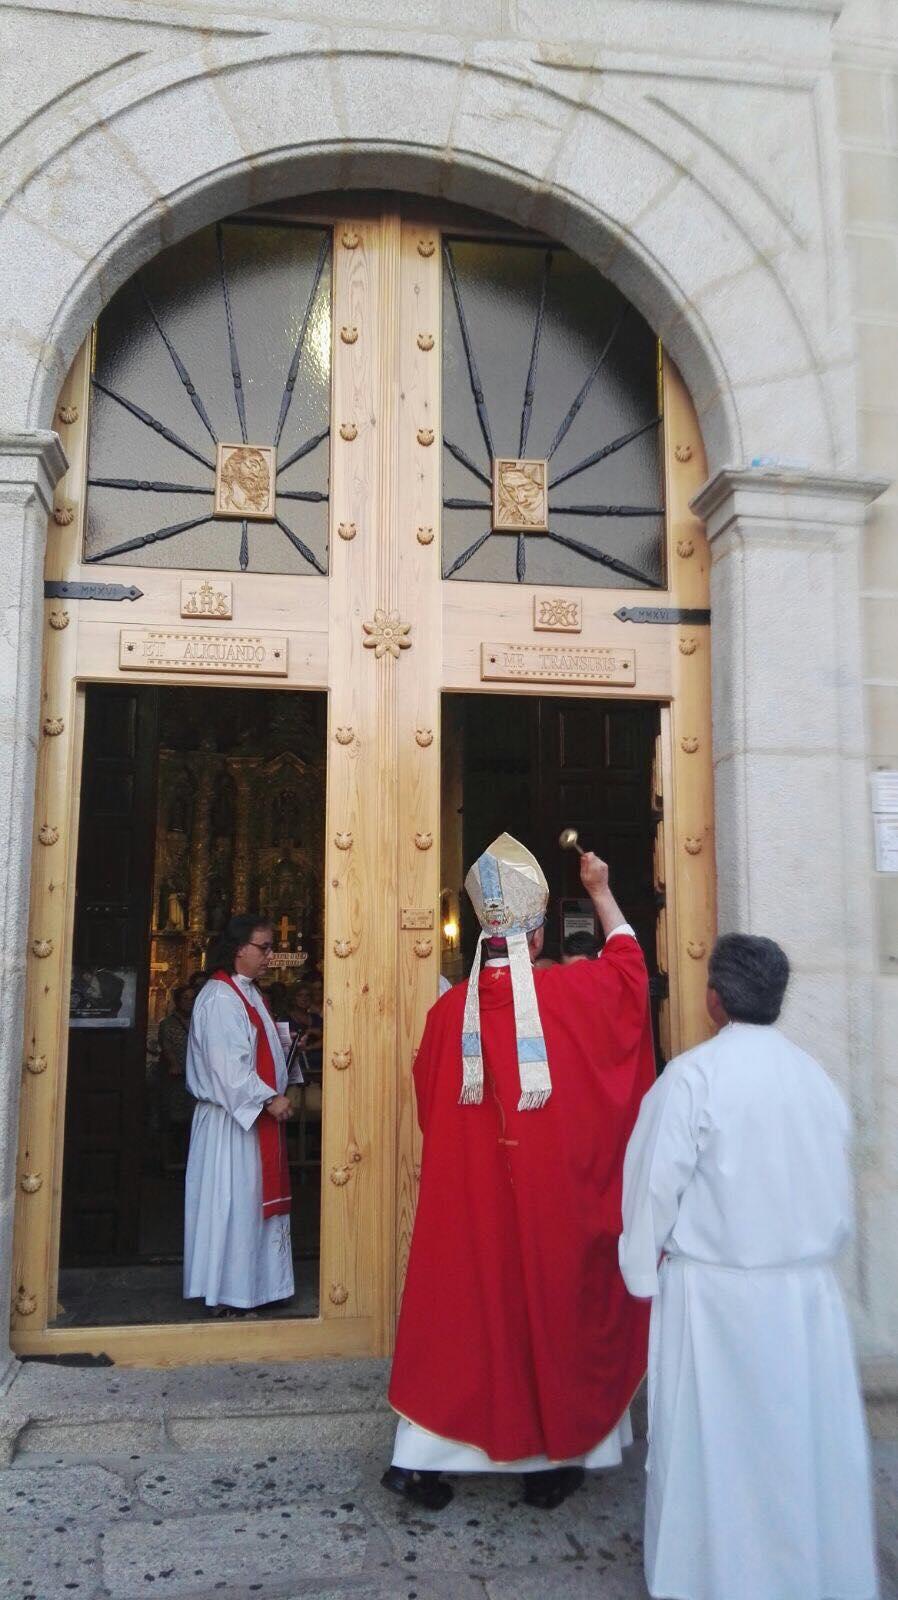 Bendición de la puerta de entrada de la Iglesia de San Andrés Apóstol